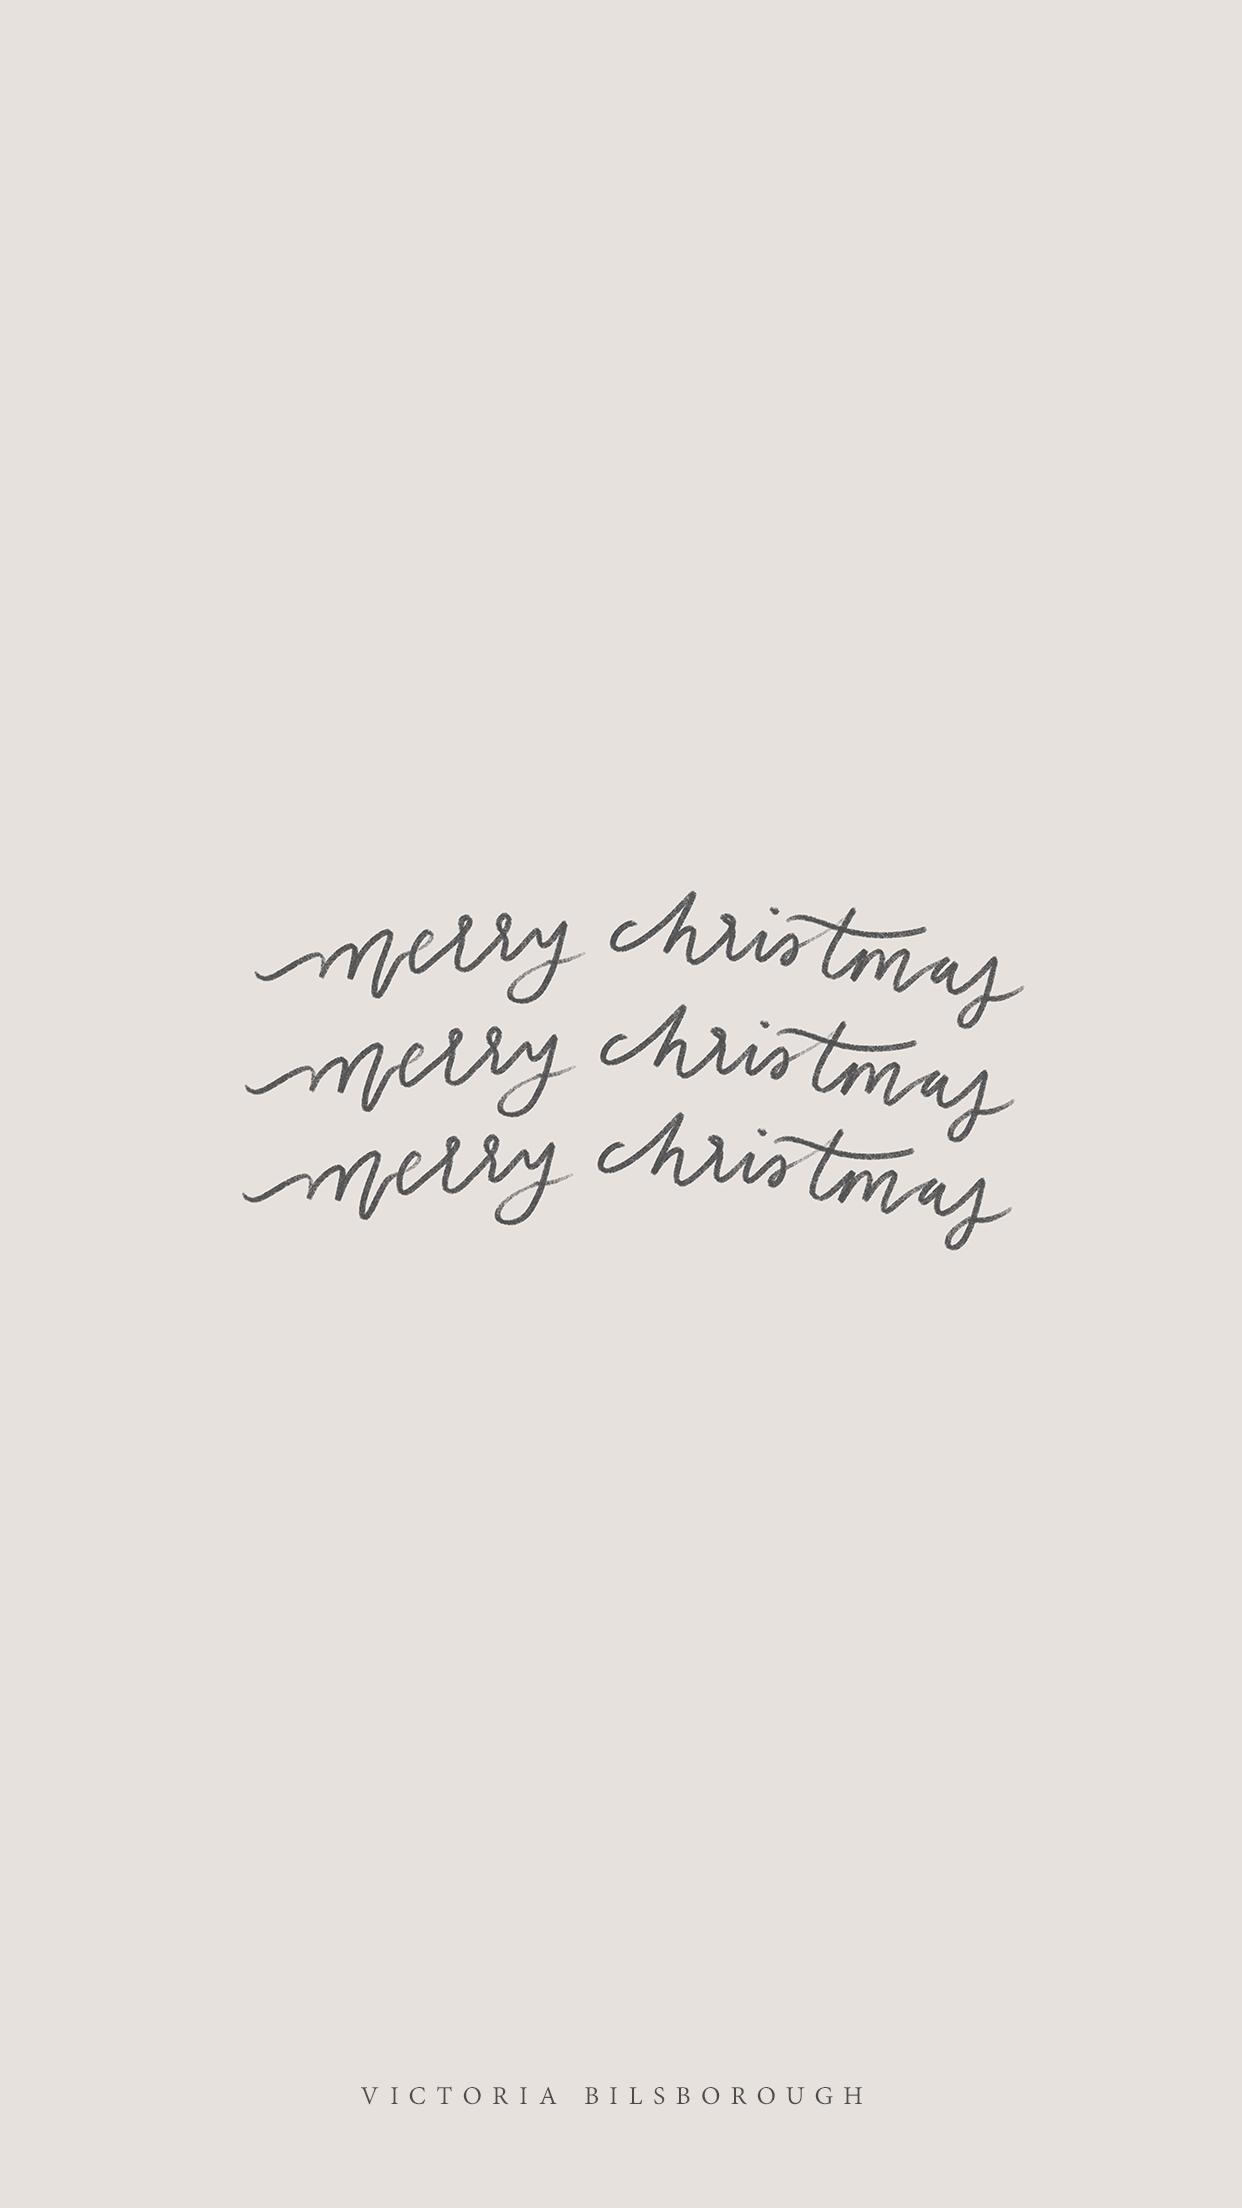 Free Christmas Wallpapers 2018 | victoriabilsborough.com